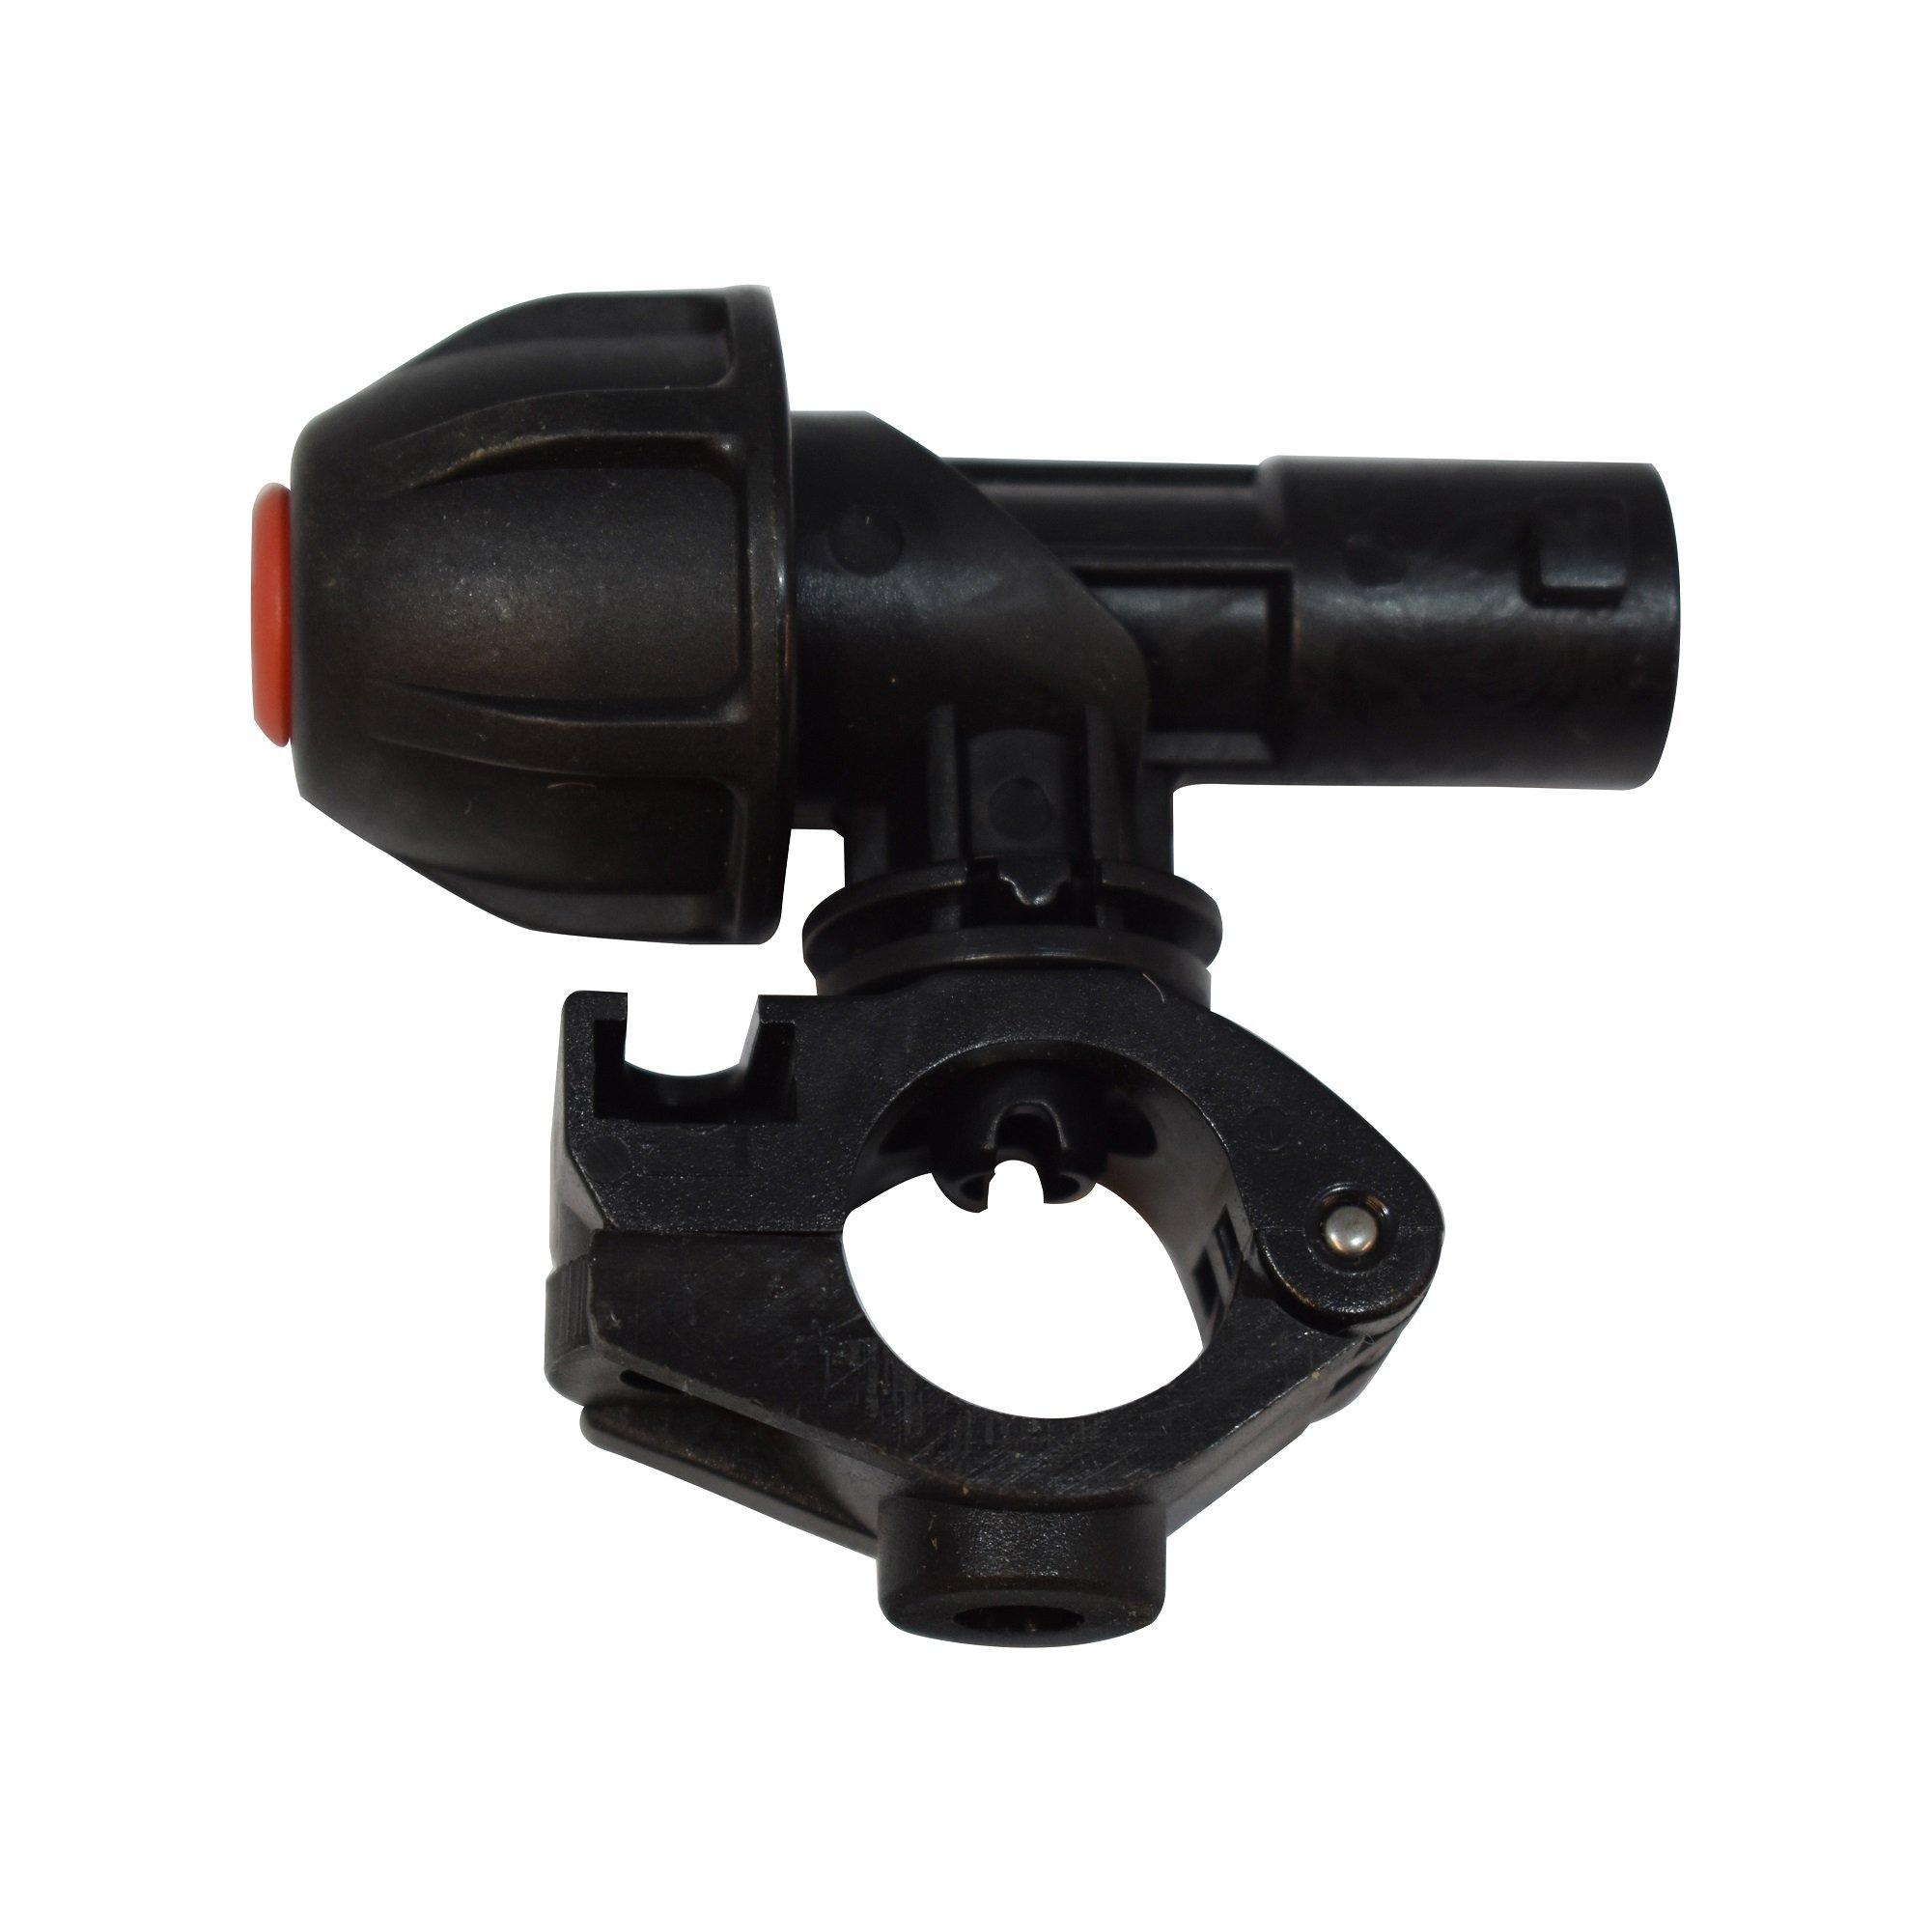 C-Dax Part - Nozzle Body - DCV - QC 22x10-90 Degree